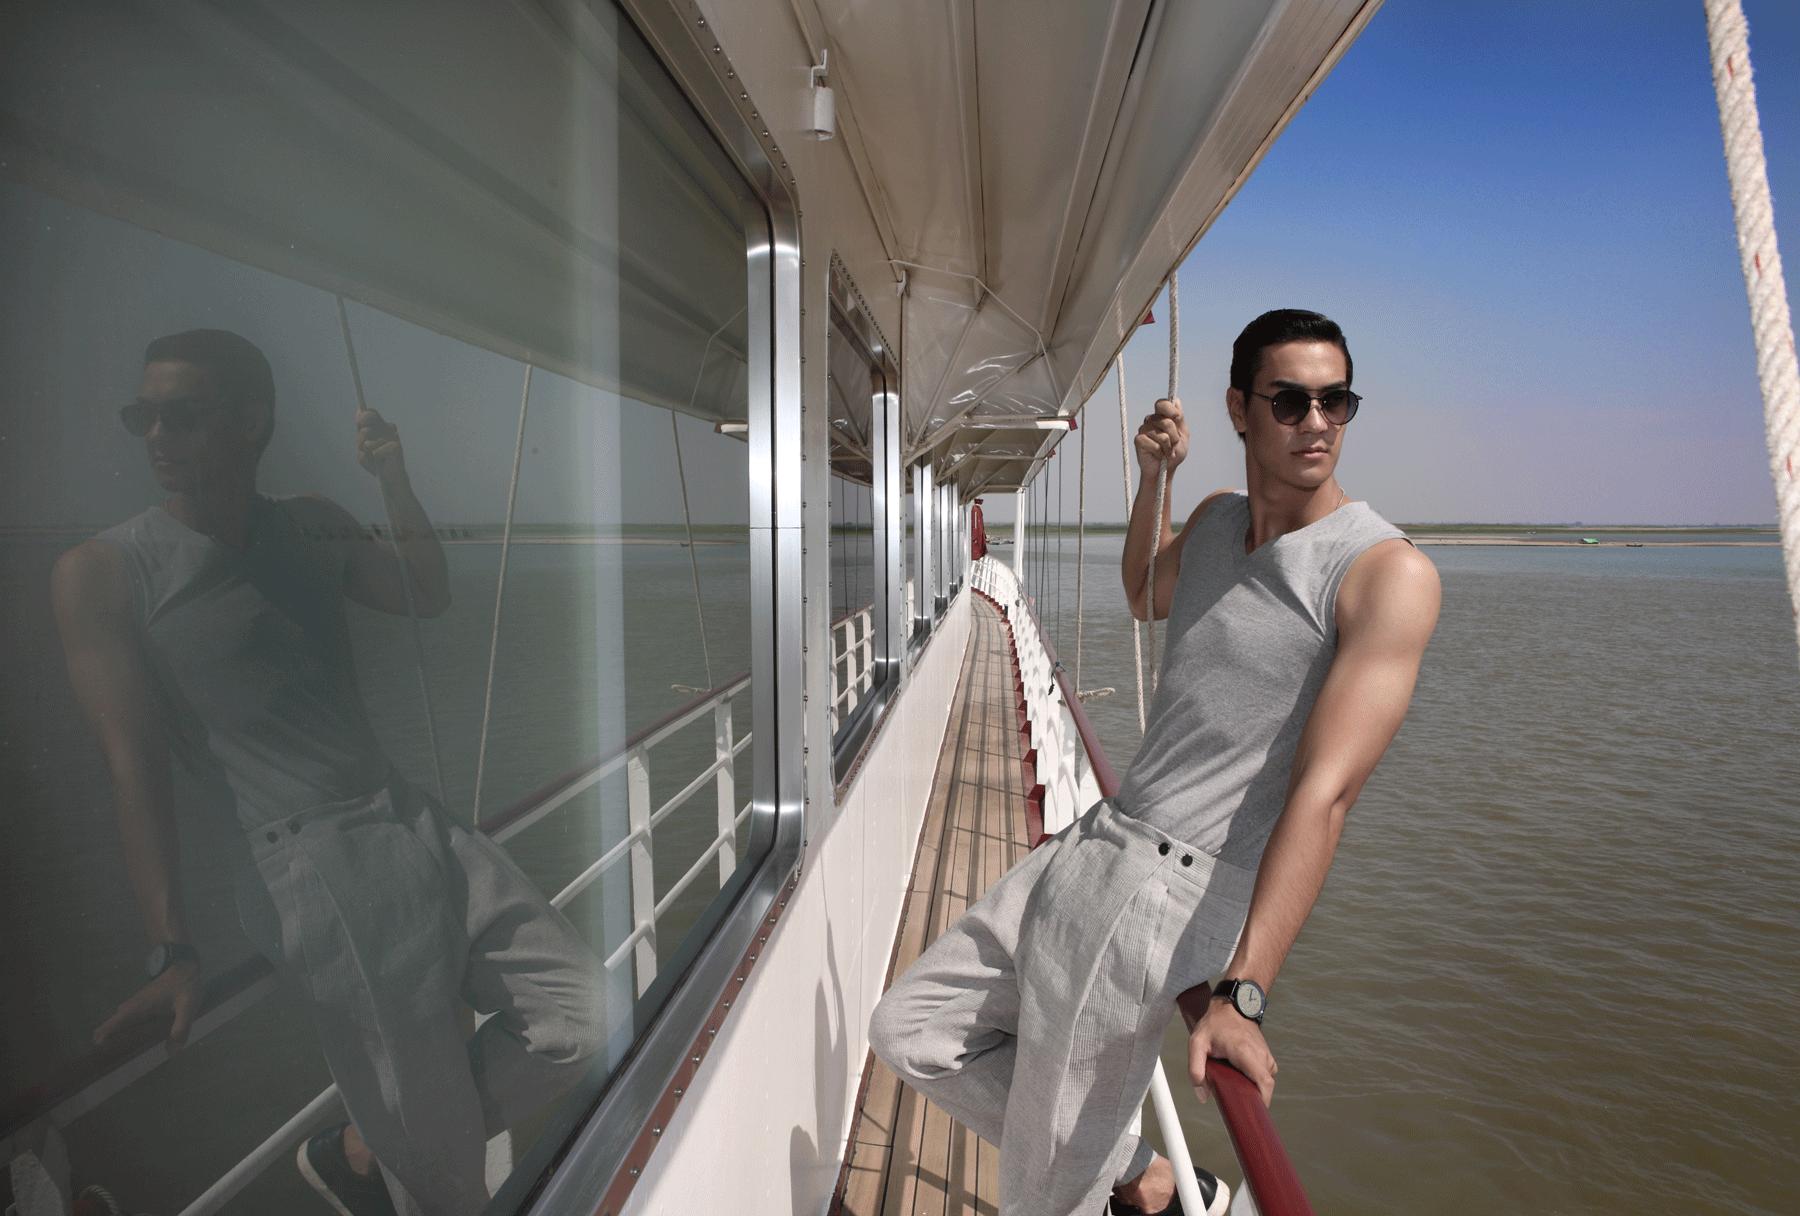 pants : Emporio Armani / tshirt : JOCKEY / watch : FORREST / sunglasses : SPEKTRE